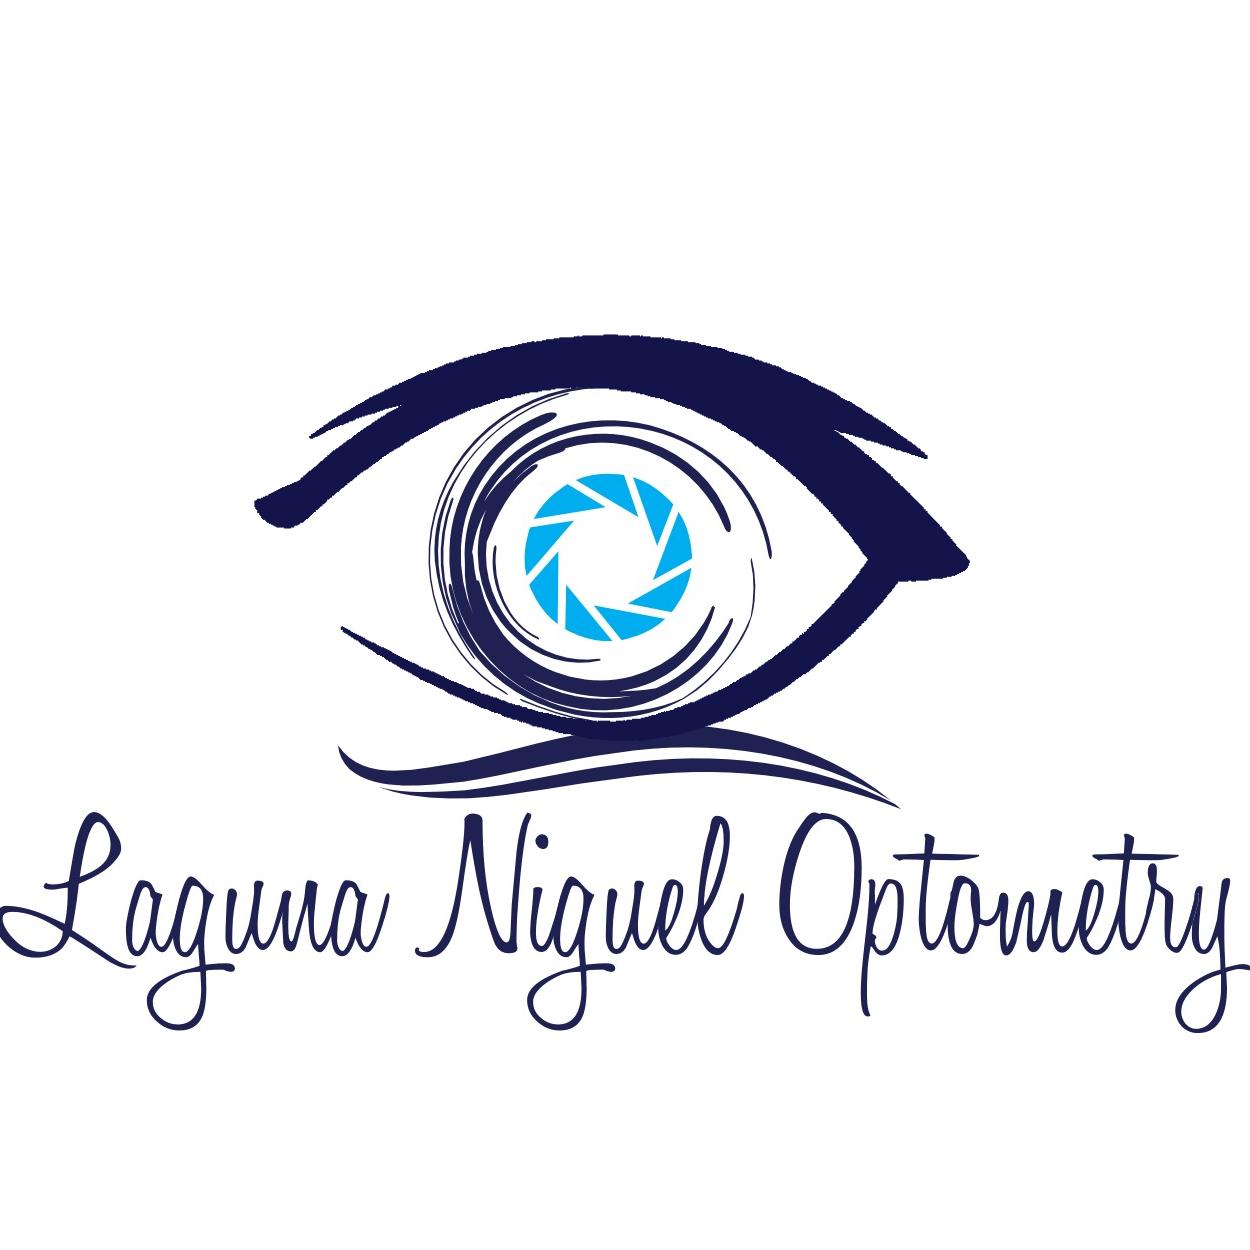 Laguna Niguel Optometry